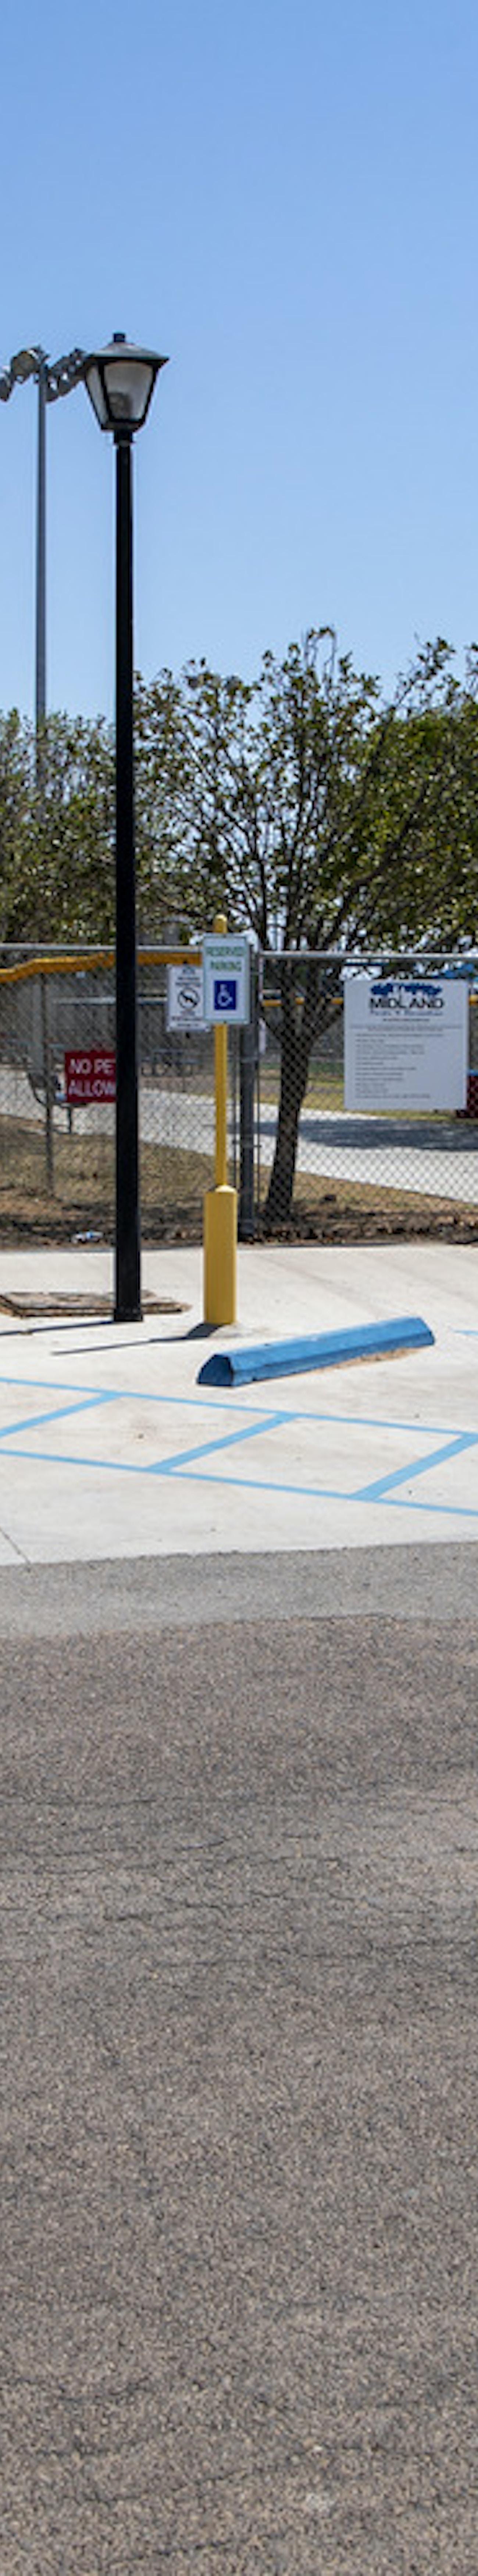 Midland Bill Williams Softball Complex Paving Renovation At Hogan Park